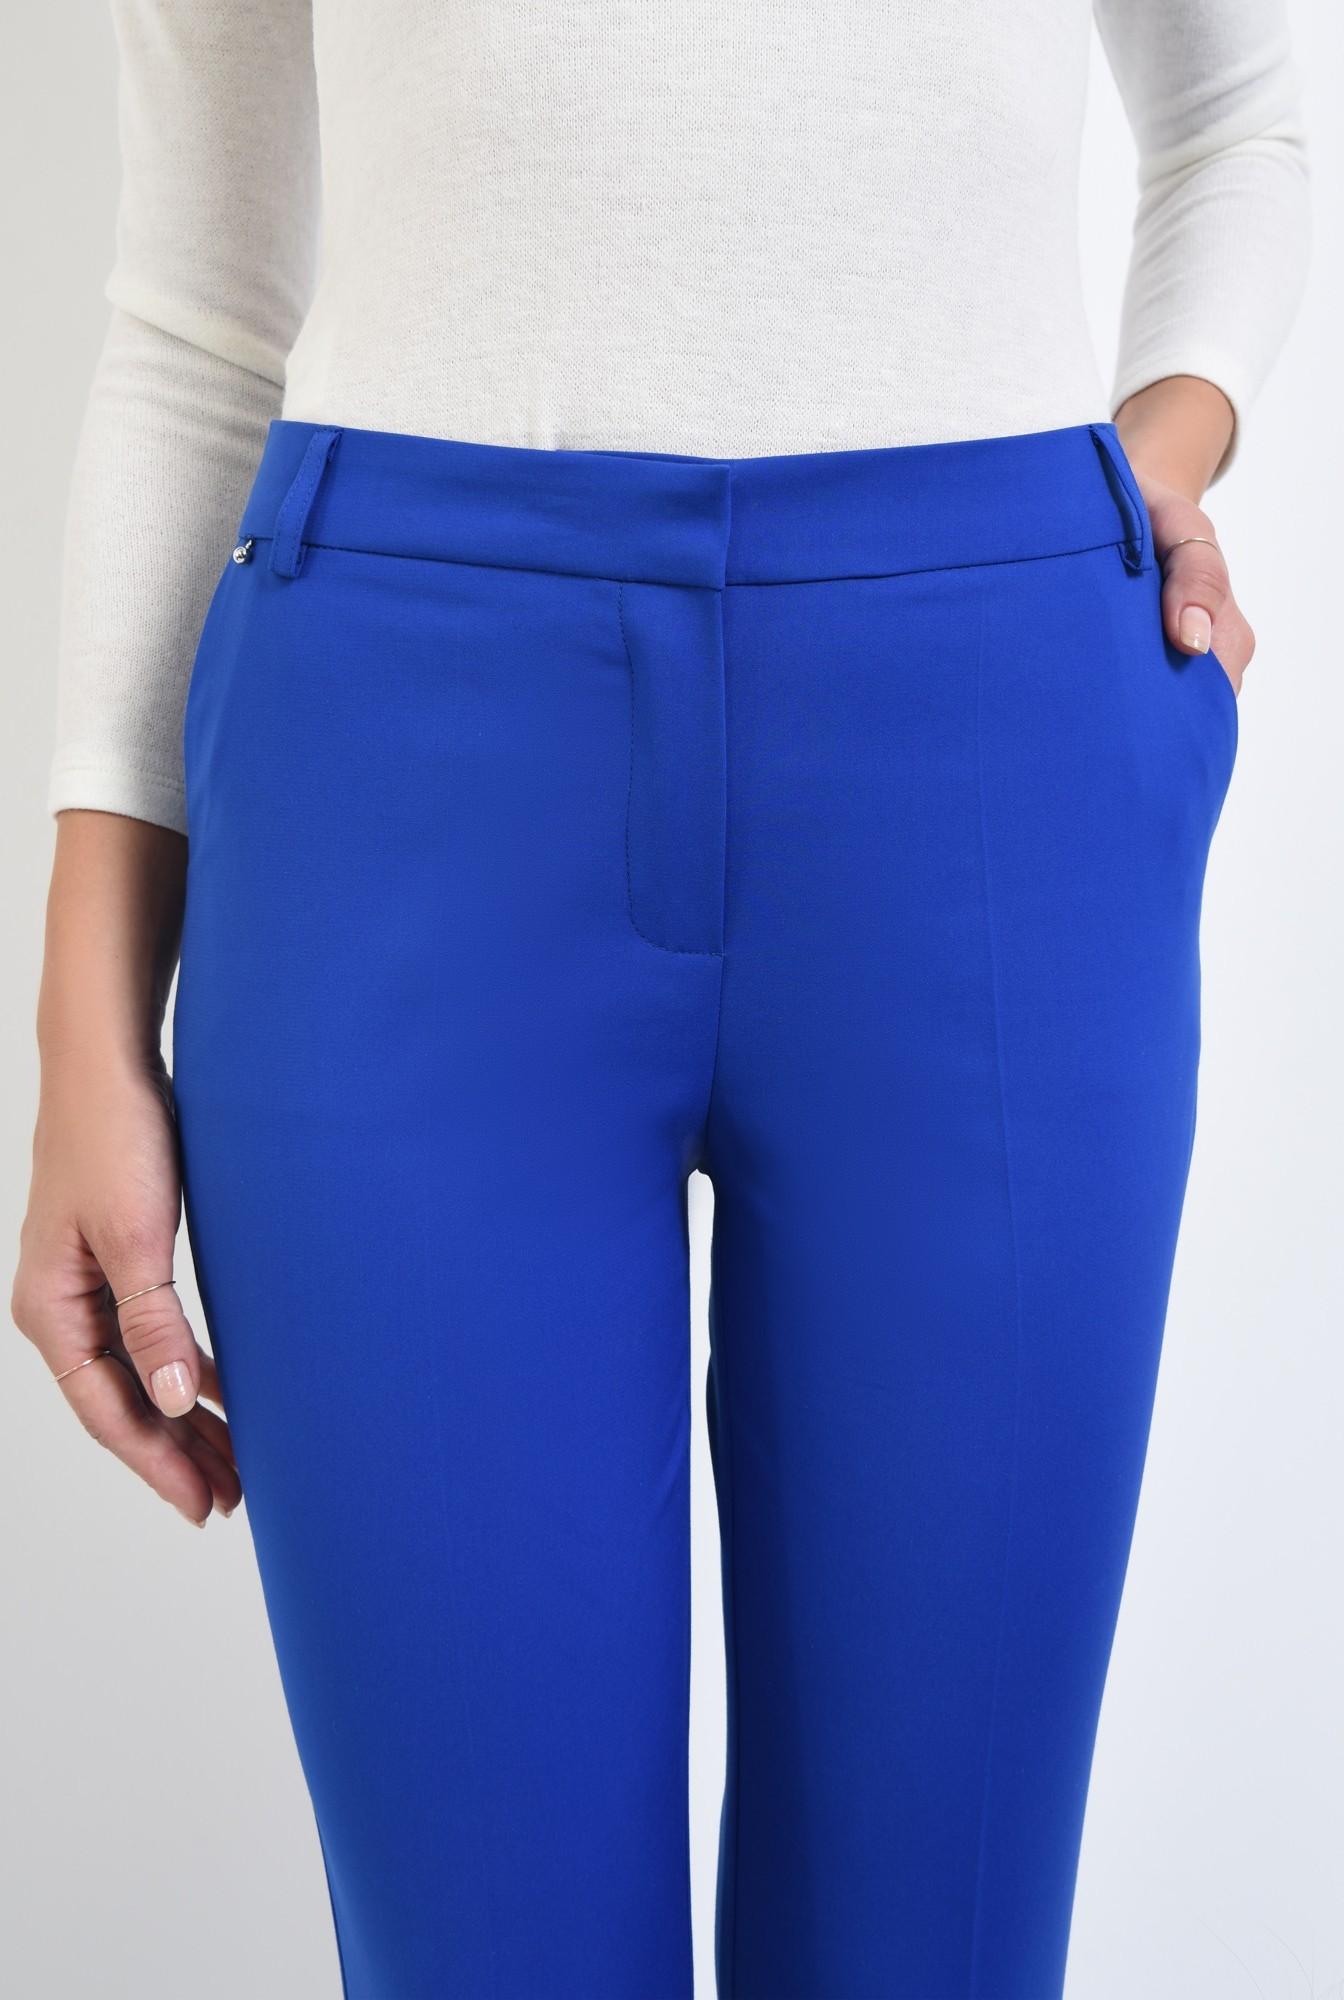 2 - pantaloni dama, online, costum, albastru, croi conic